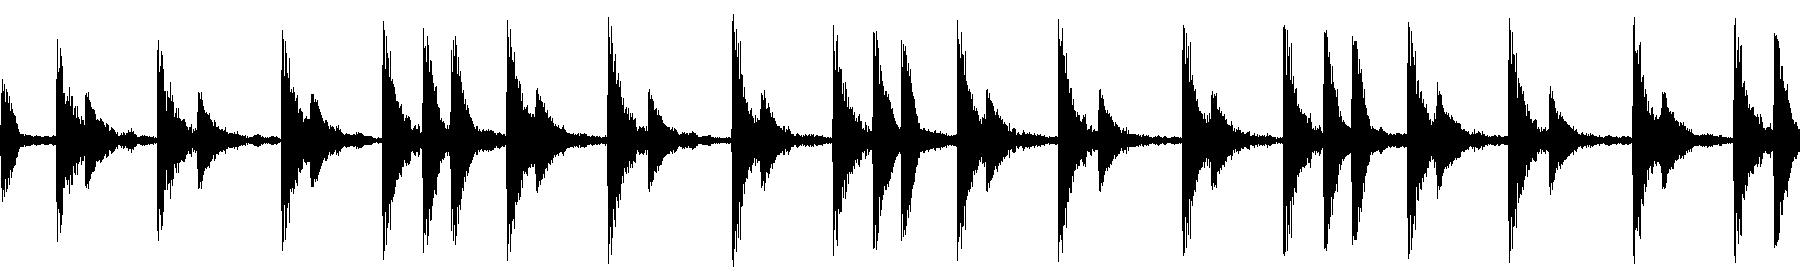 vedh melodyloop 054 fm 124bpm